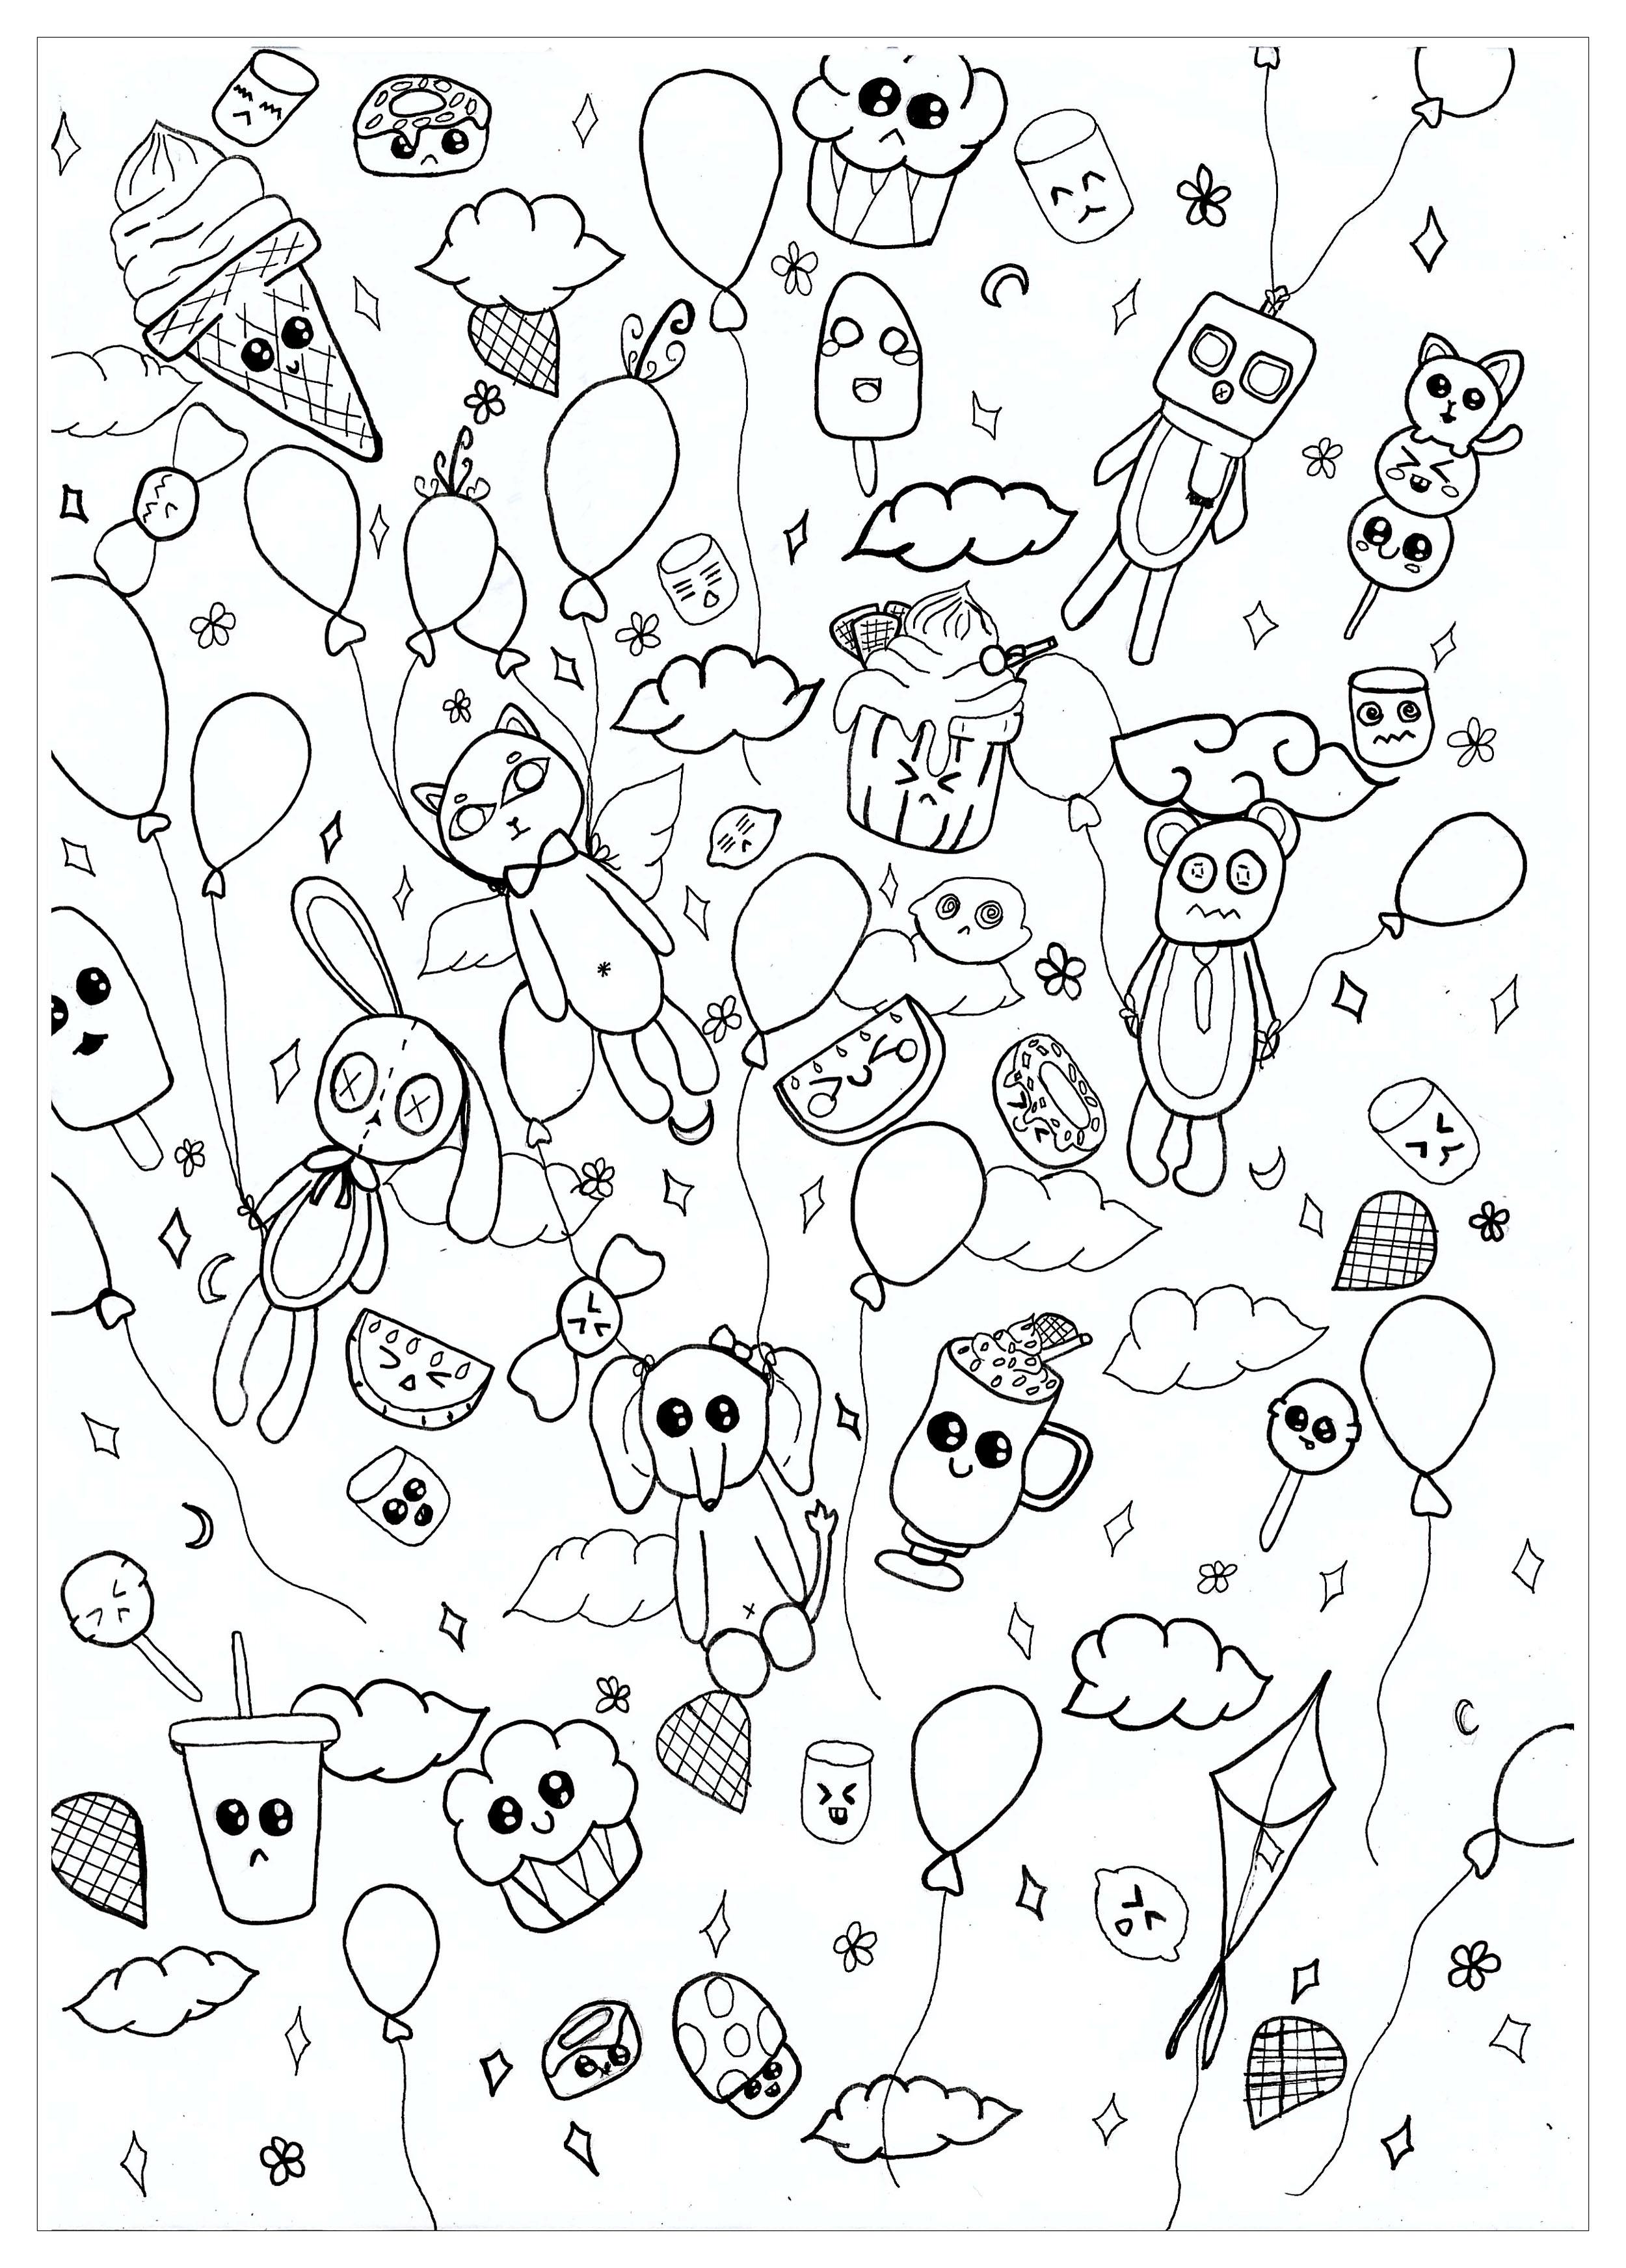 Disegni da colorare per adulti : Doodle art / Doodling - 52